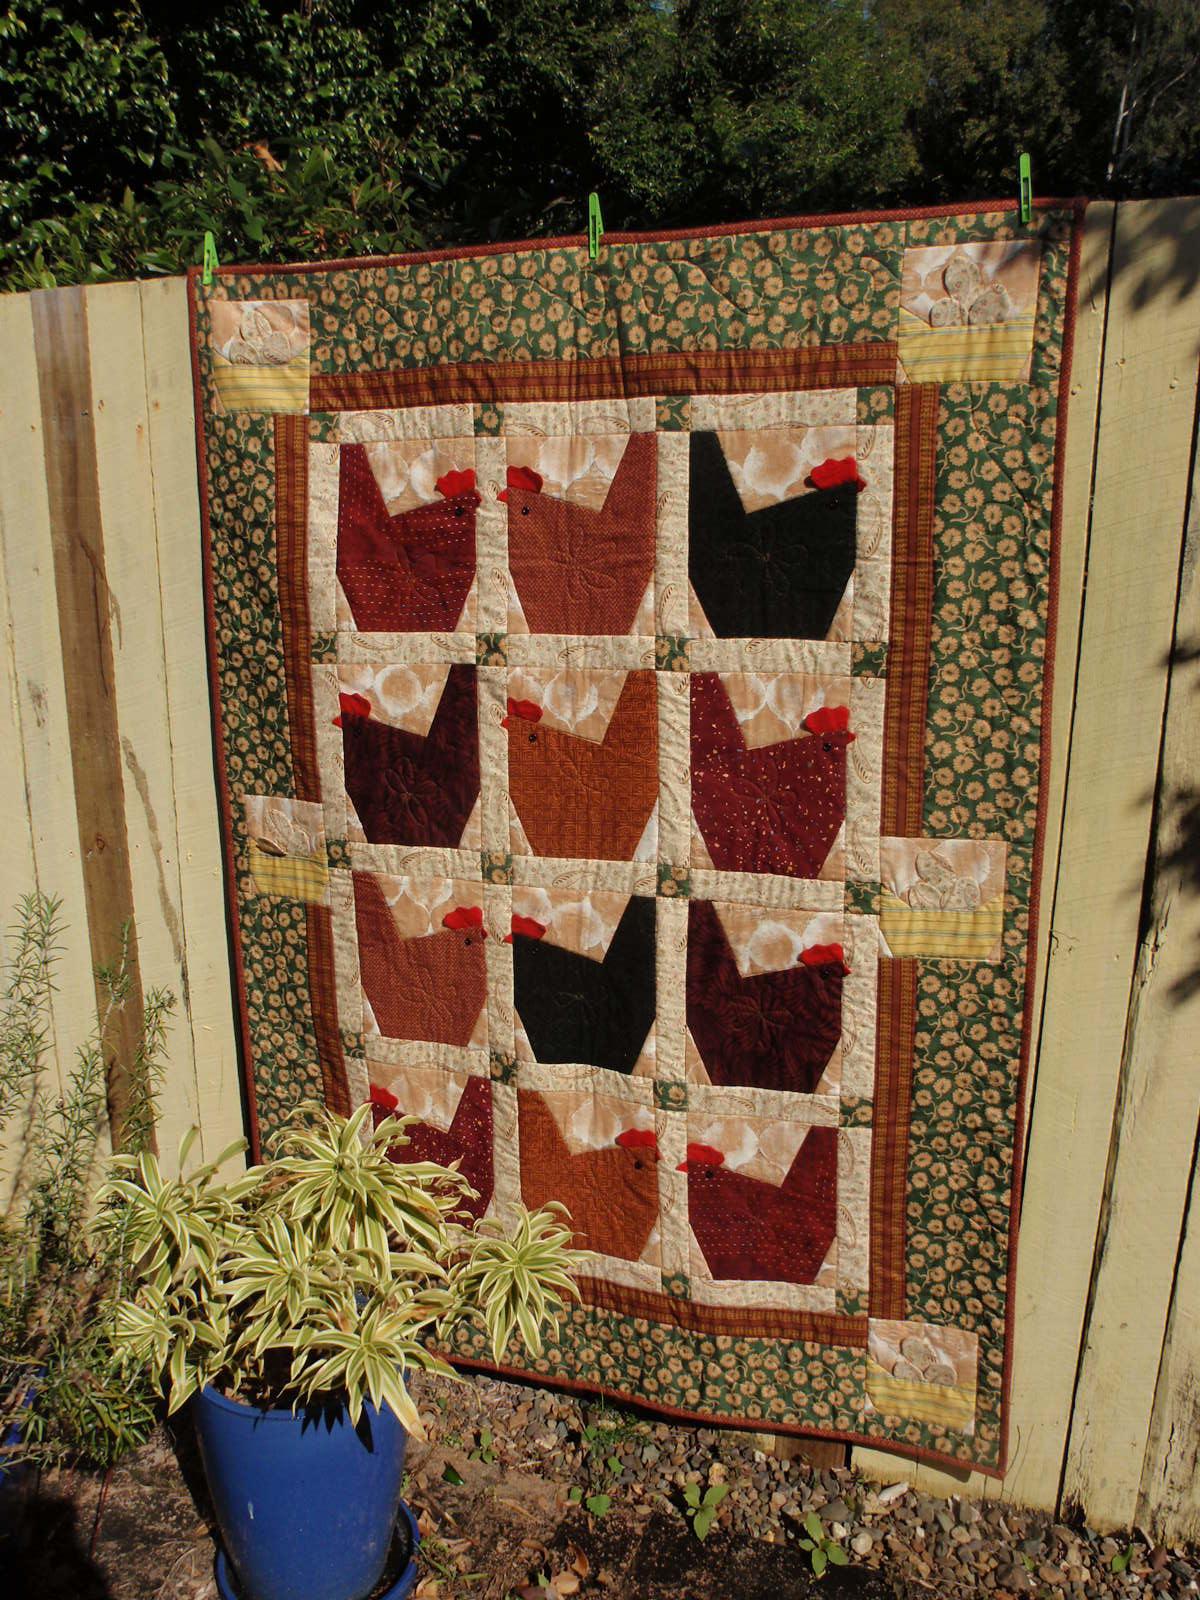 Speckled Hen Quilts images : speckled hen quilt shop - Adamdwight.com